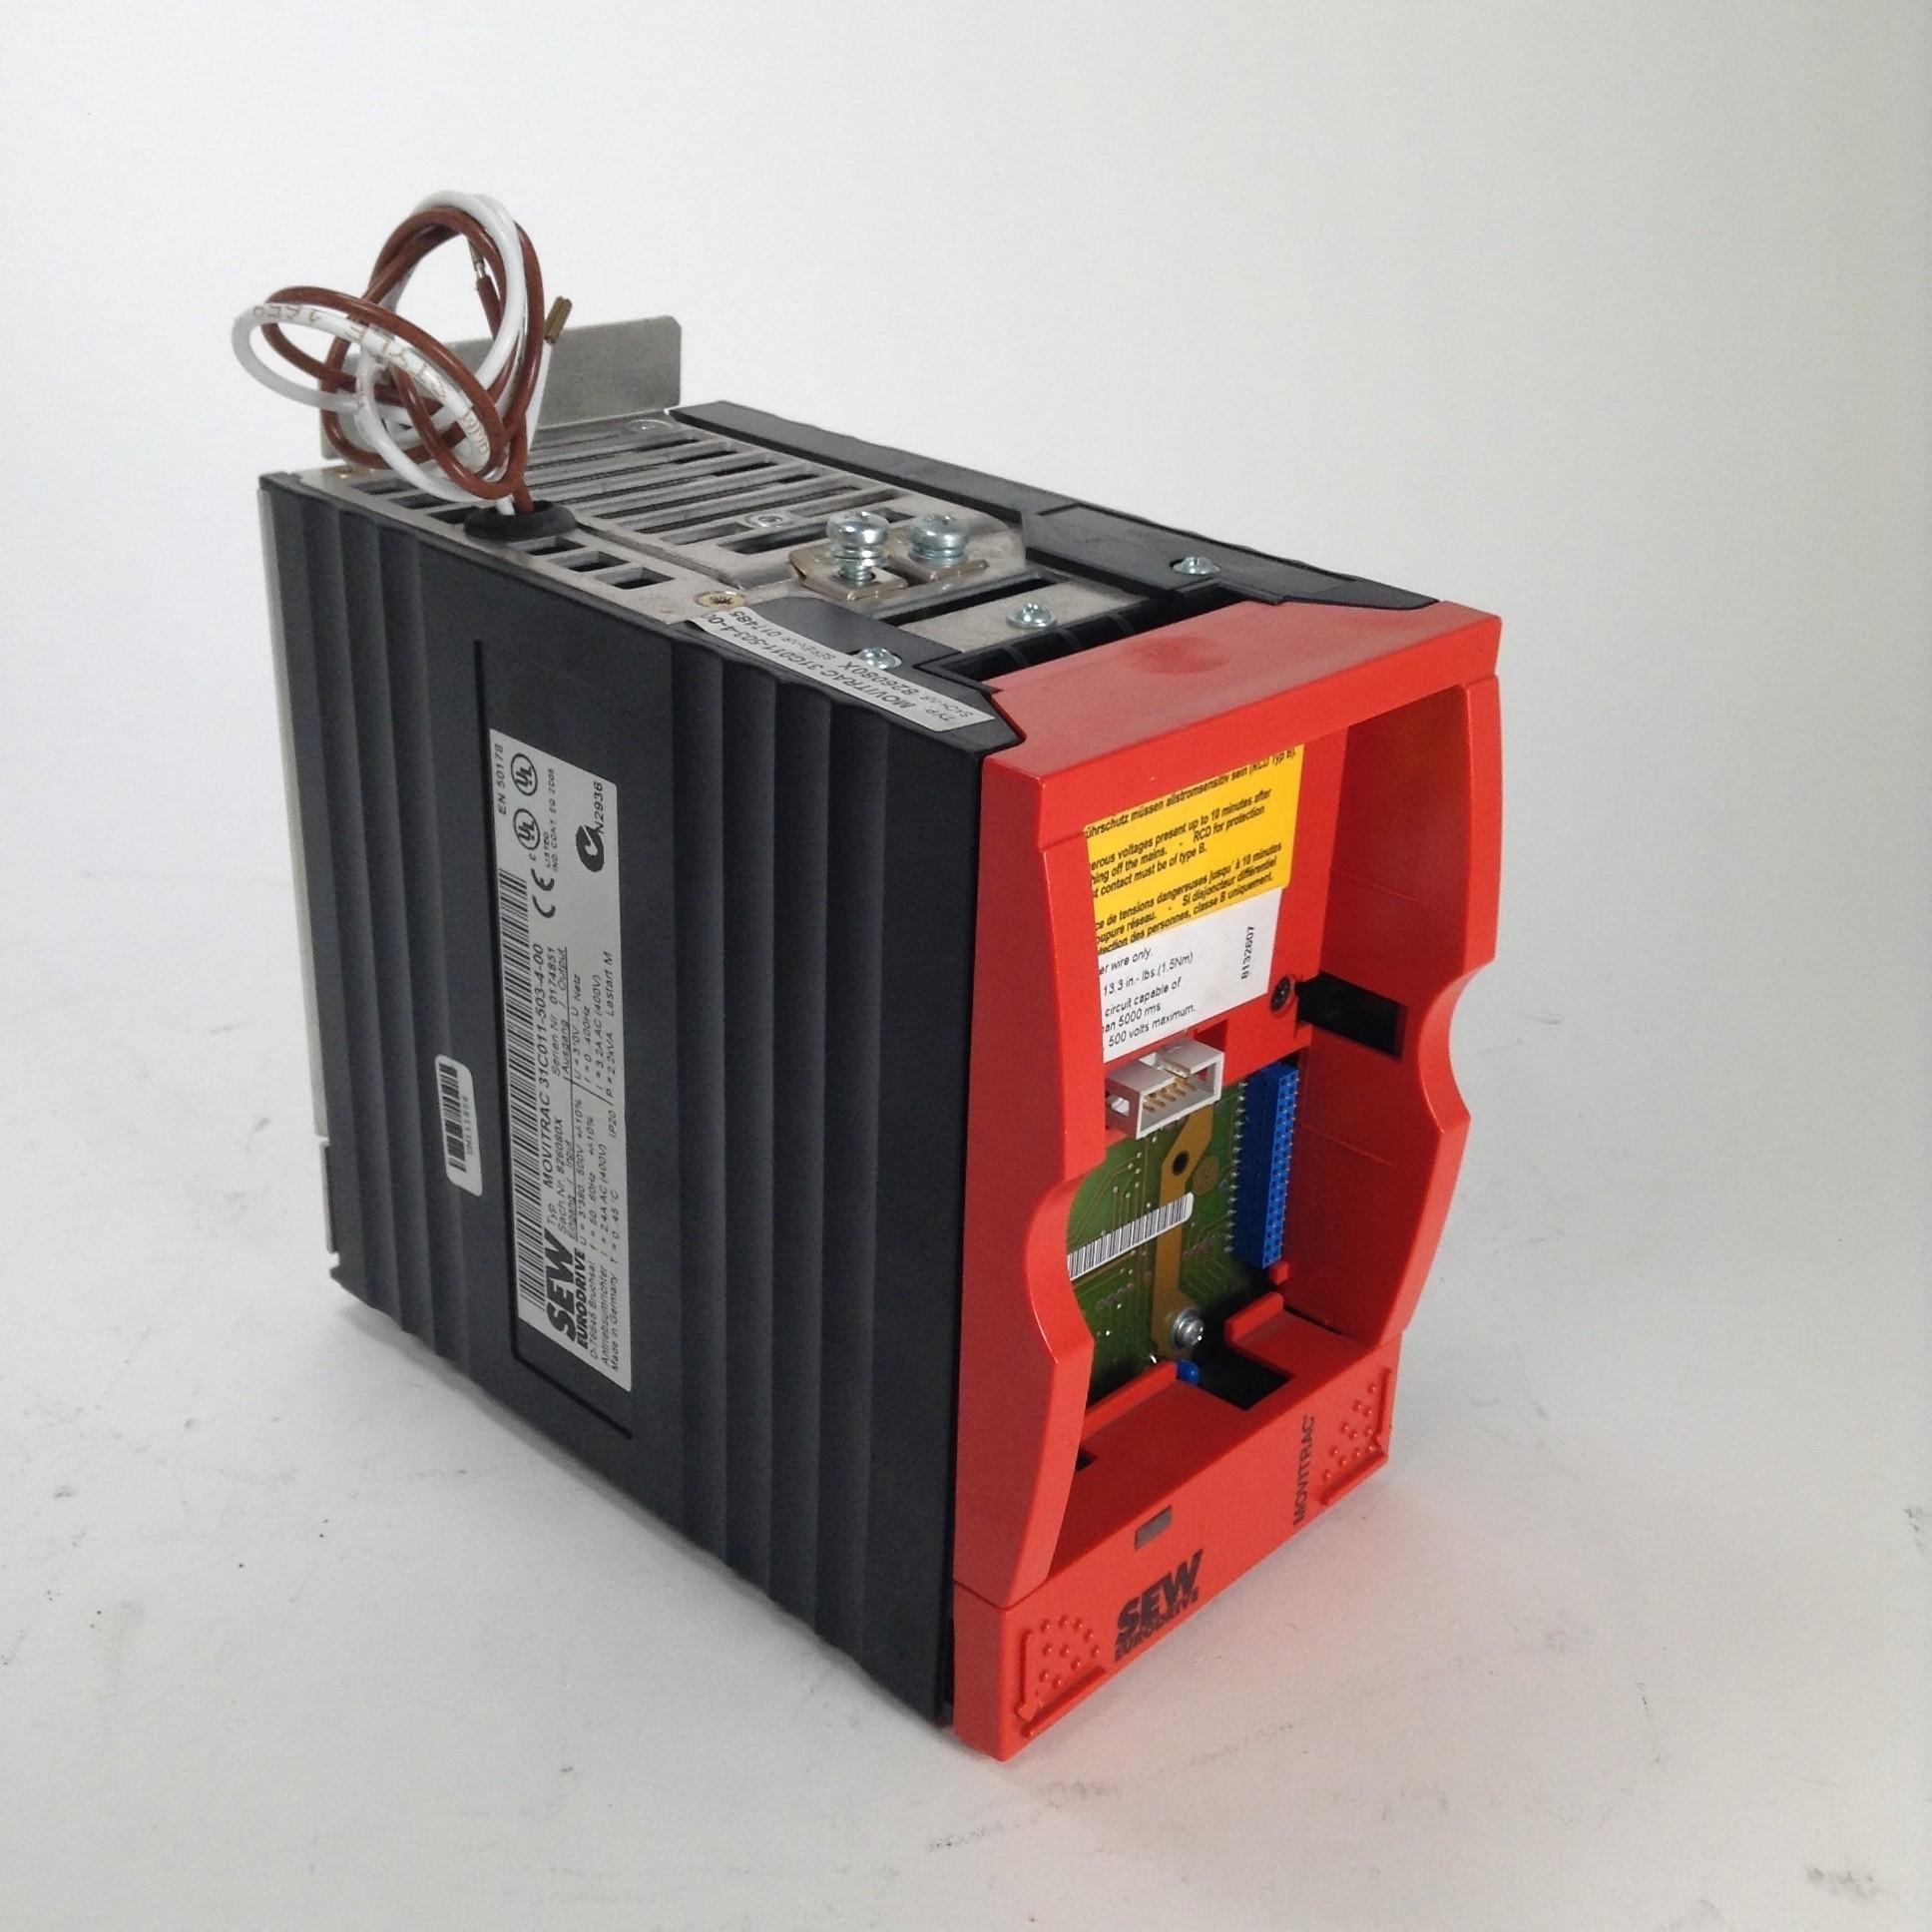 Sew Eurodrive 31C011-503-4-00 Movitrac Antriebsumrichter drive Used UMP